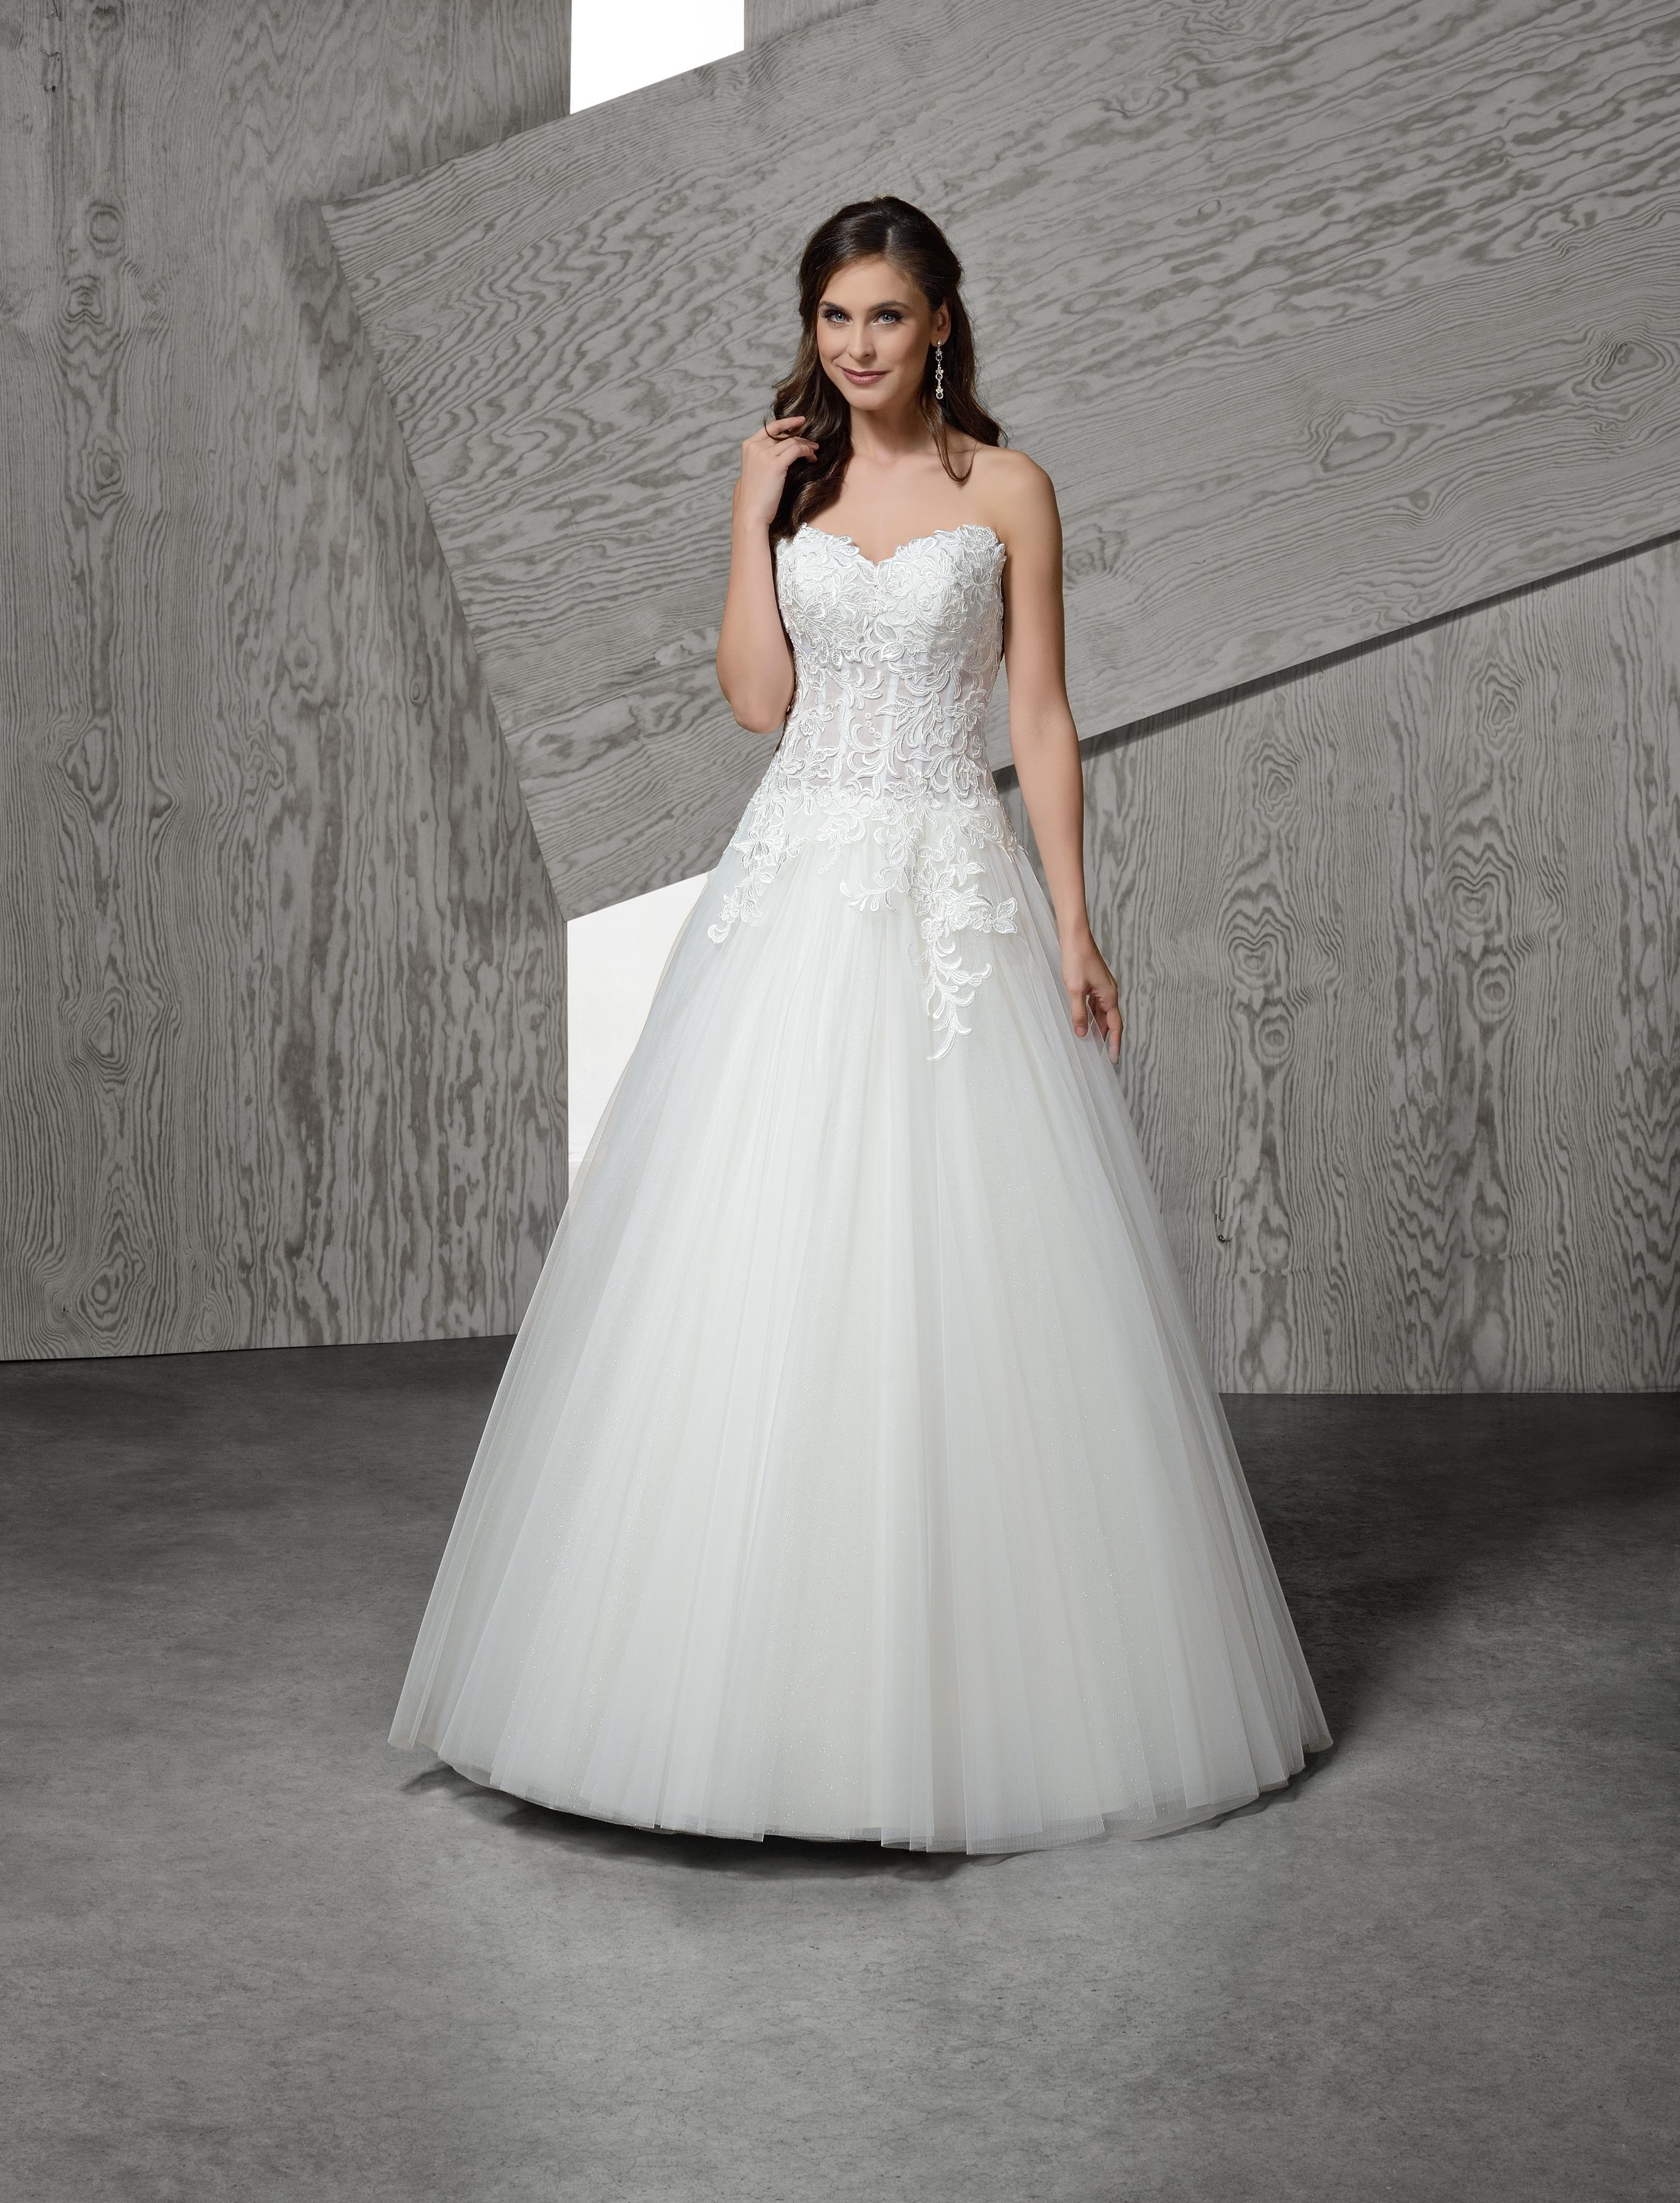 Merry di Glamorosa spose